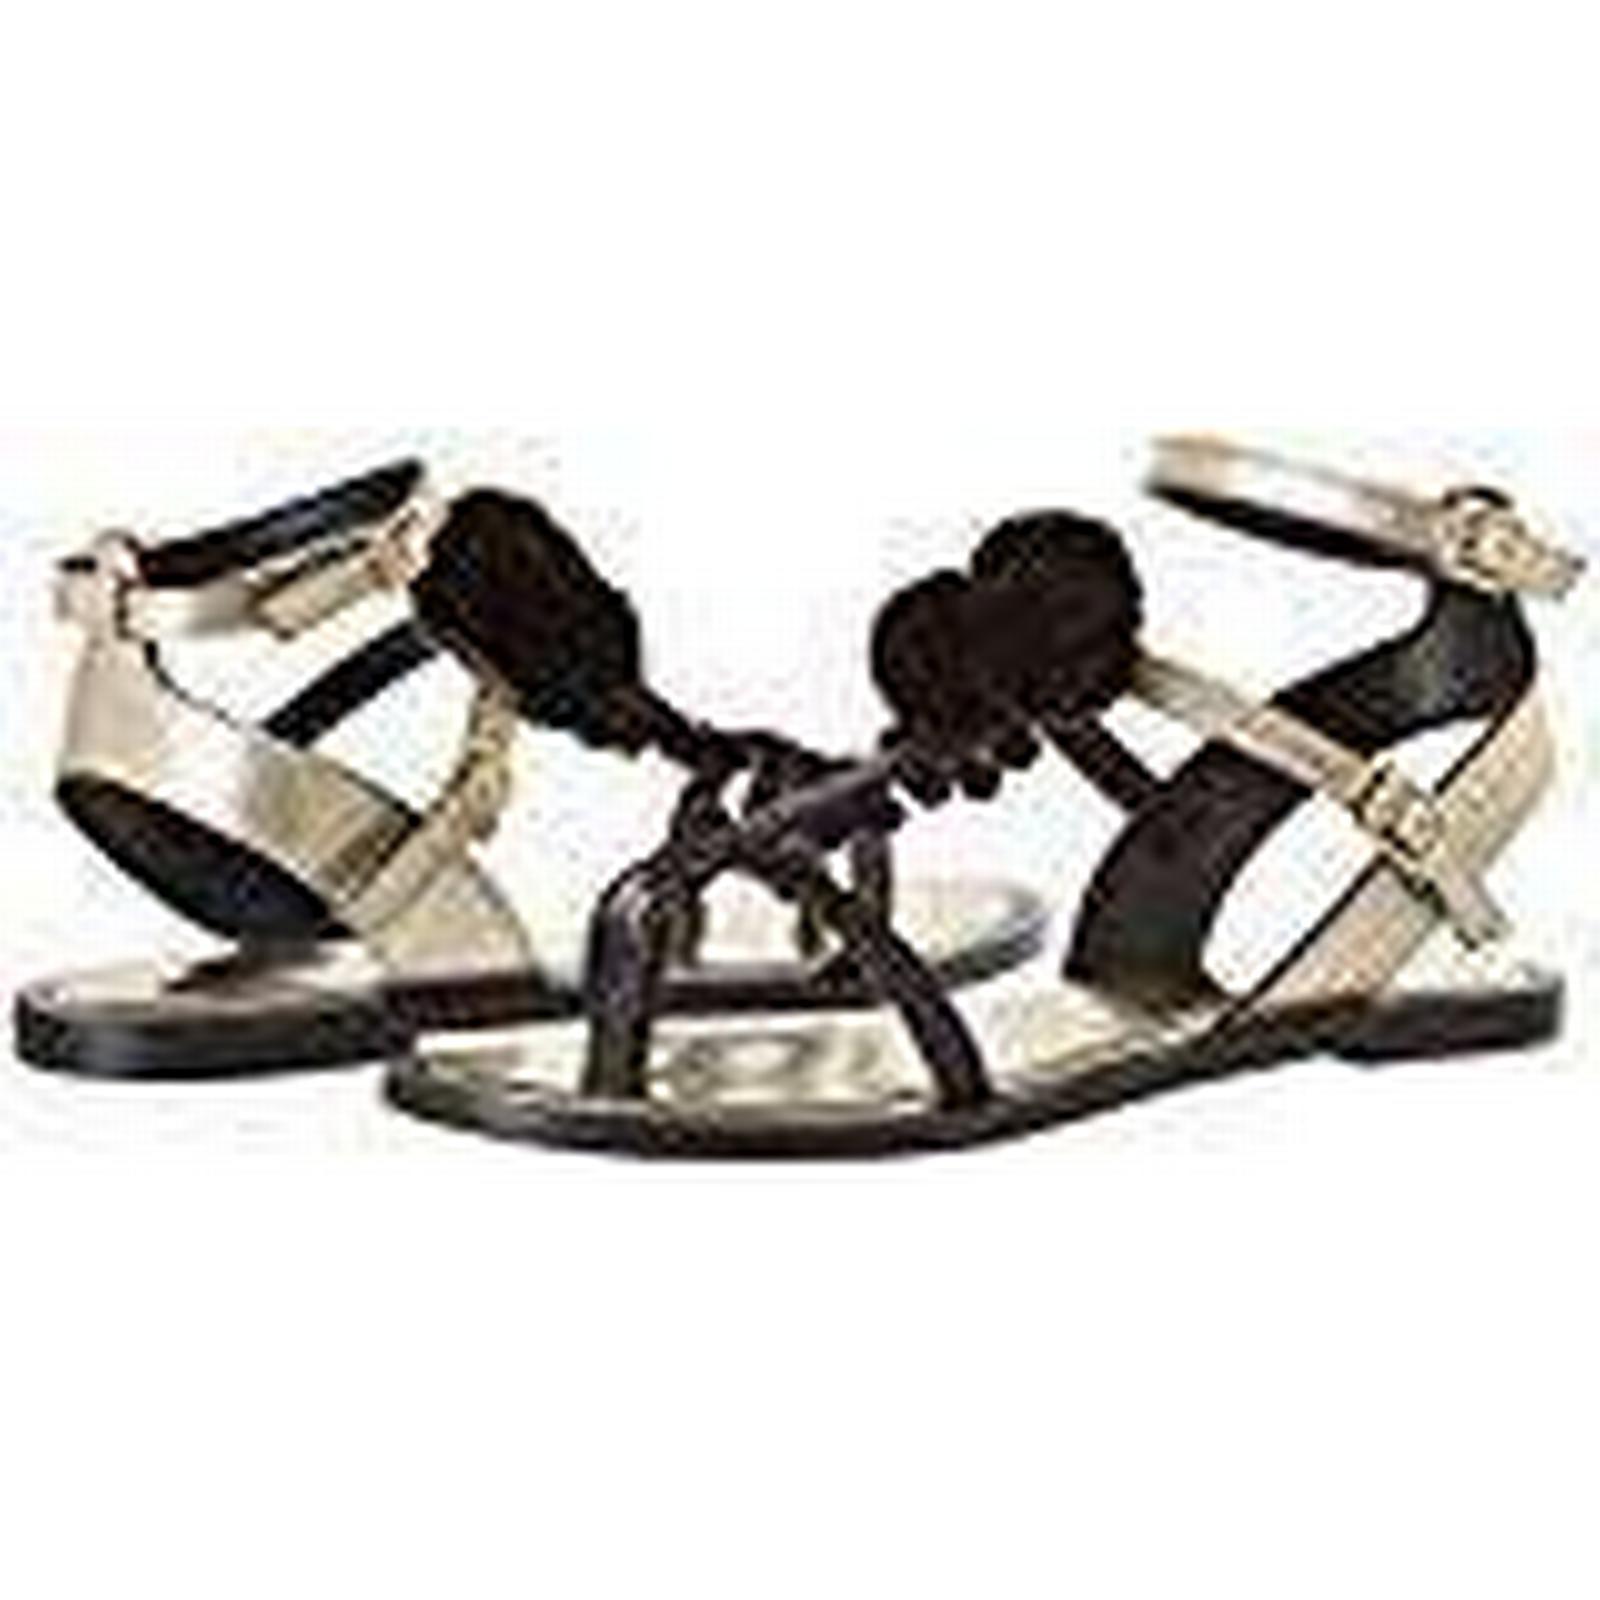 Pennyblack High Women 55211117 High Pennyblack Heels Black Size: 39 a86185